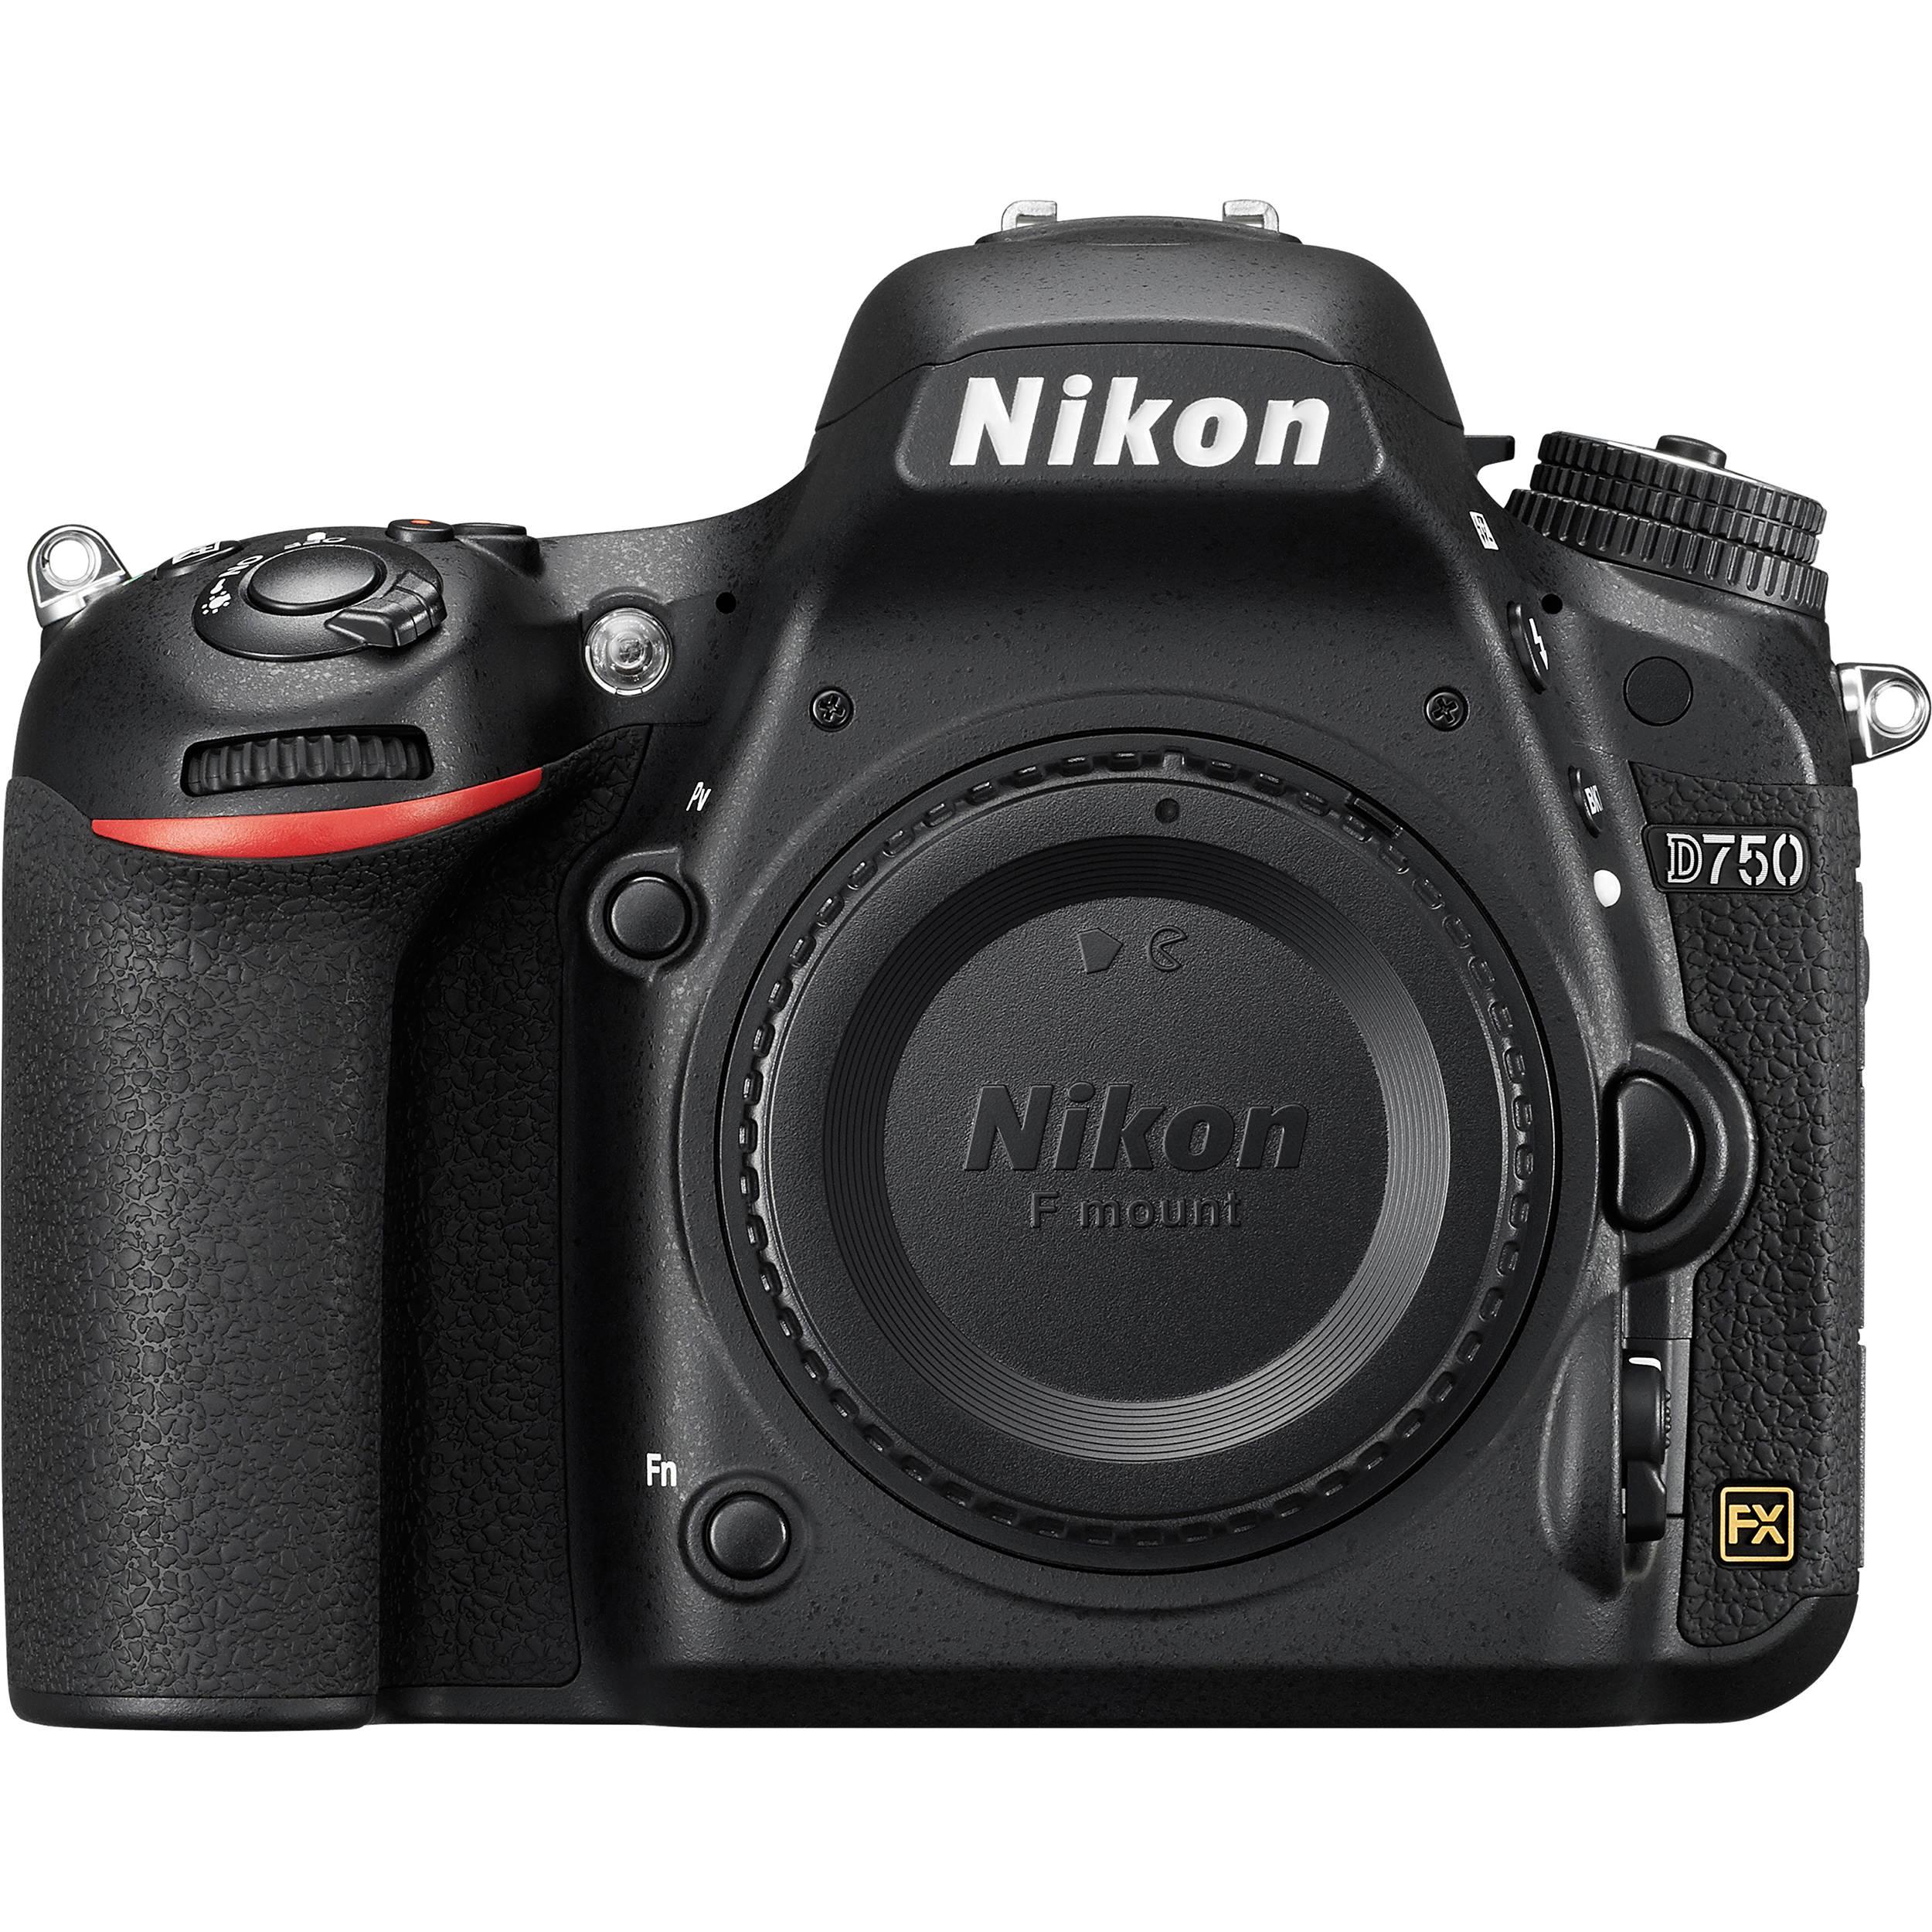 Nikon D750 DSLR Camera (Body Only) 1543 B&H Photo Video